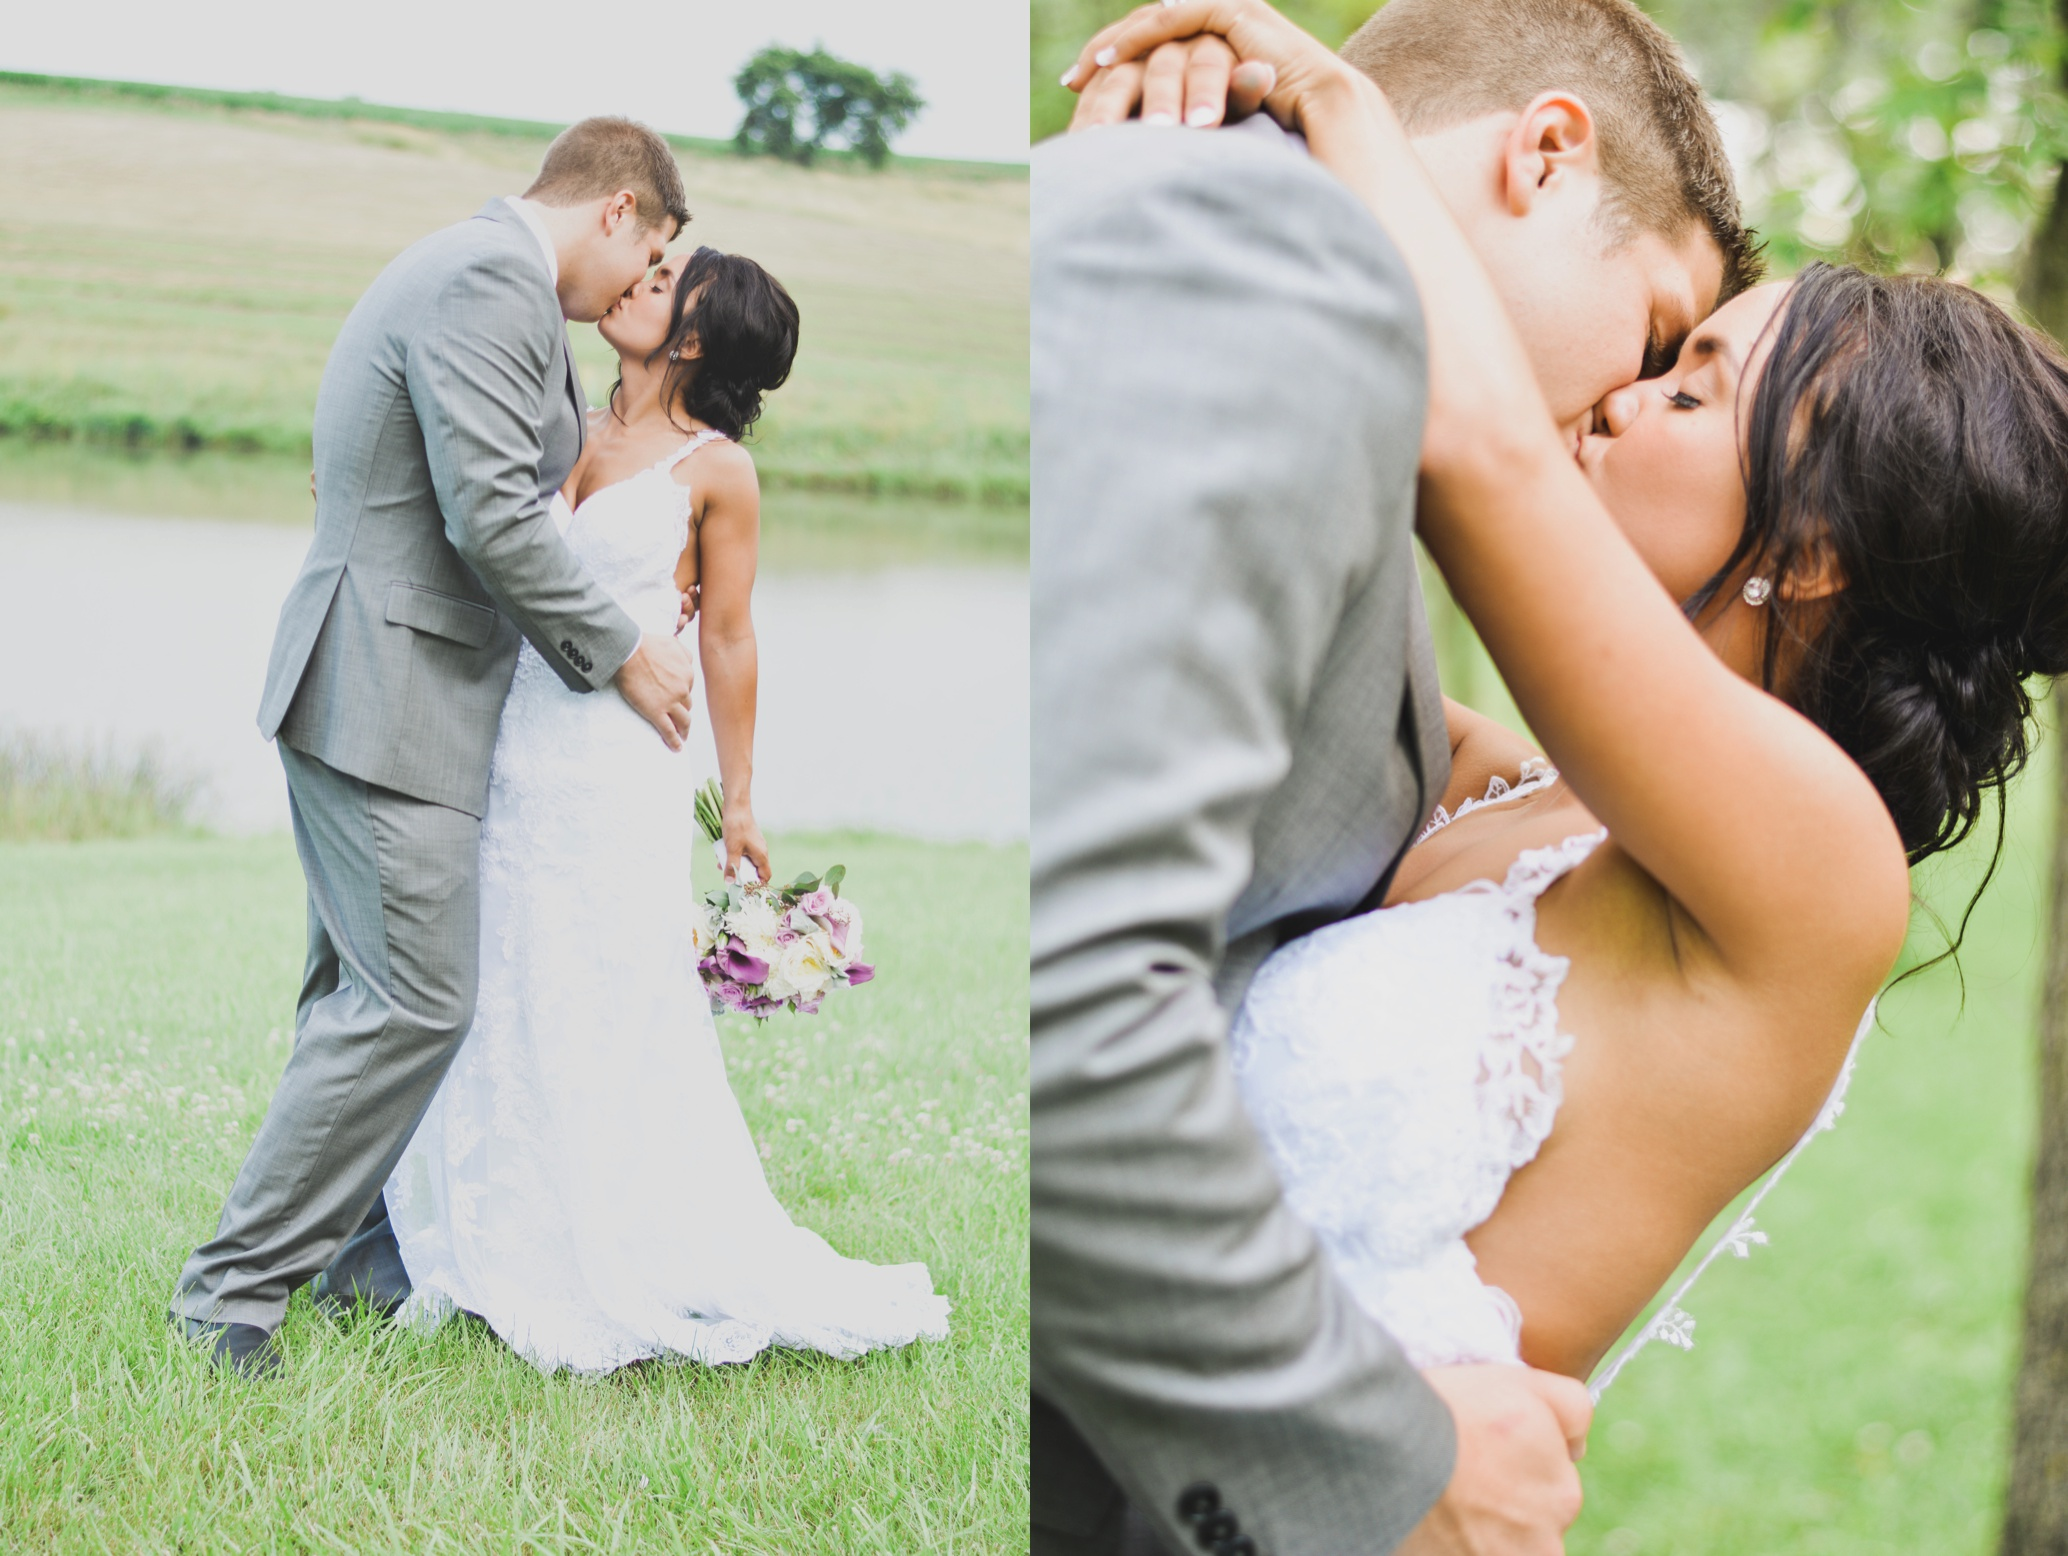 Barnes' Place Rustic Outdoor Wedding | Ali Leigh Photo Minneapolis Wedding Photographer_0160.jpg